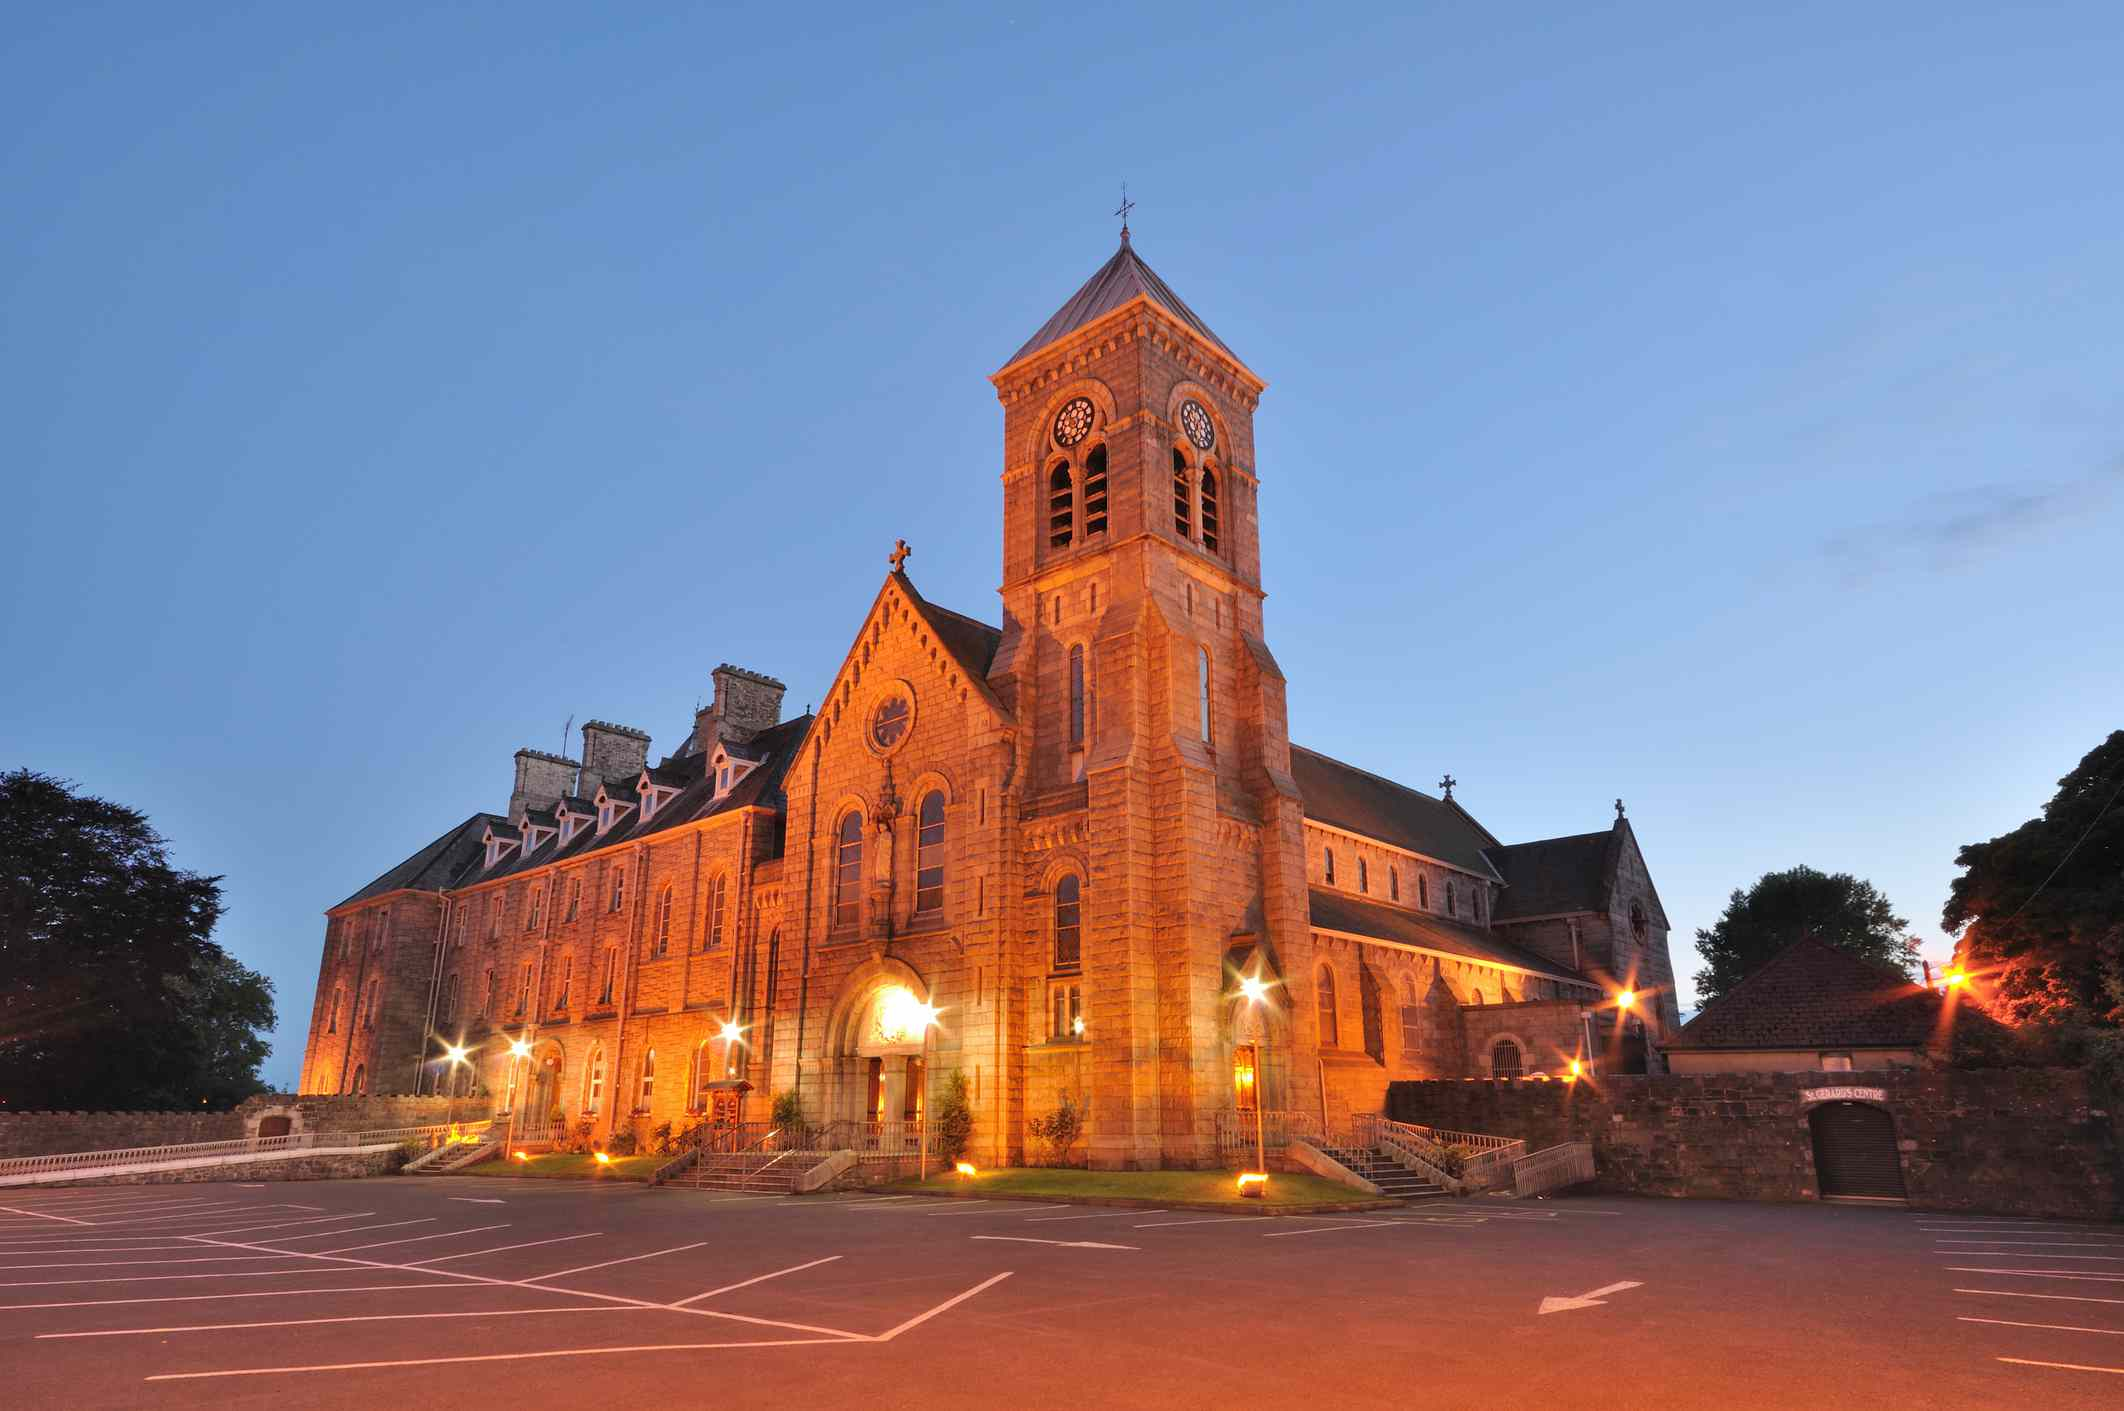 The granite St. Joseph's Redemptorist Church bathed in orange light at twilight